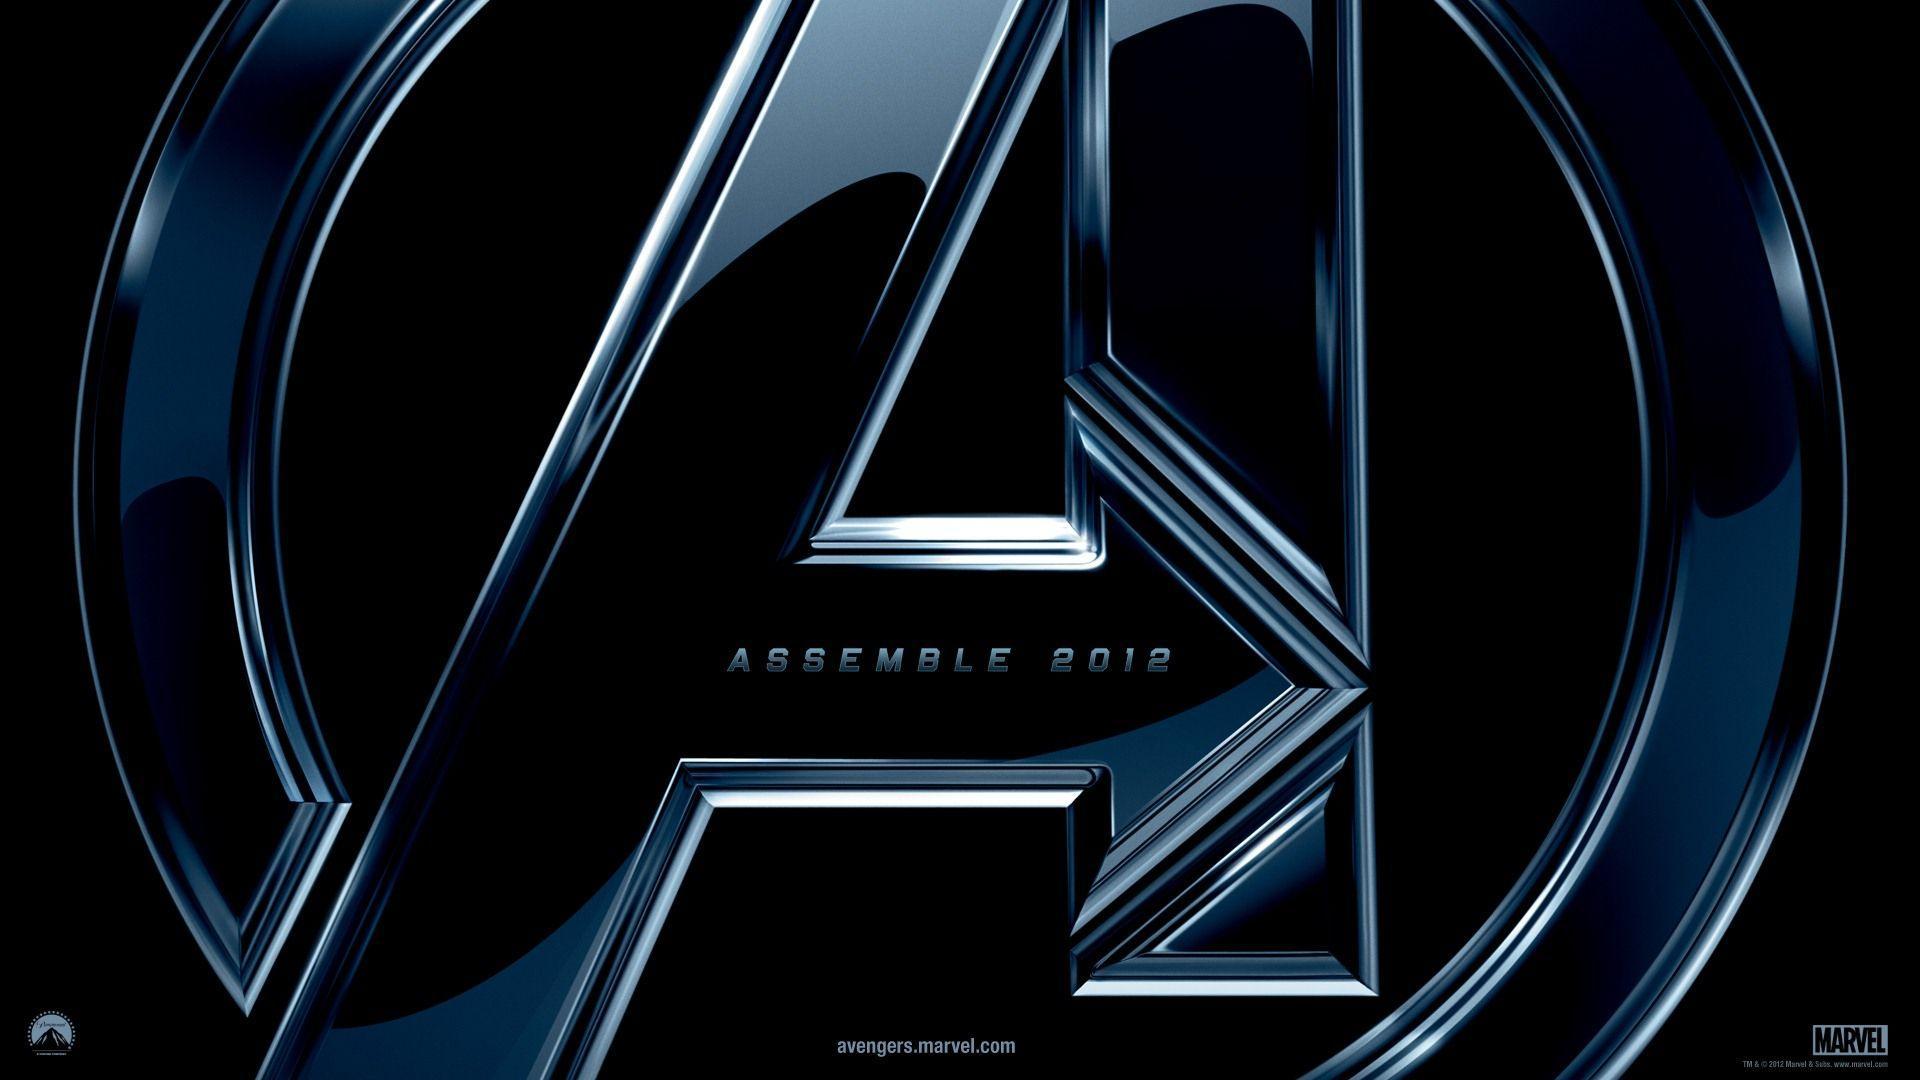 Wallpapers For > Avengers Wallpaper Hd 2012